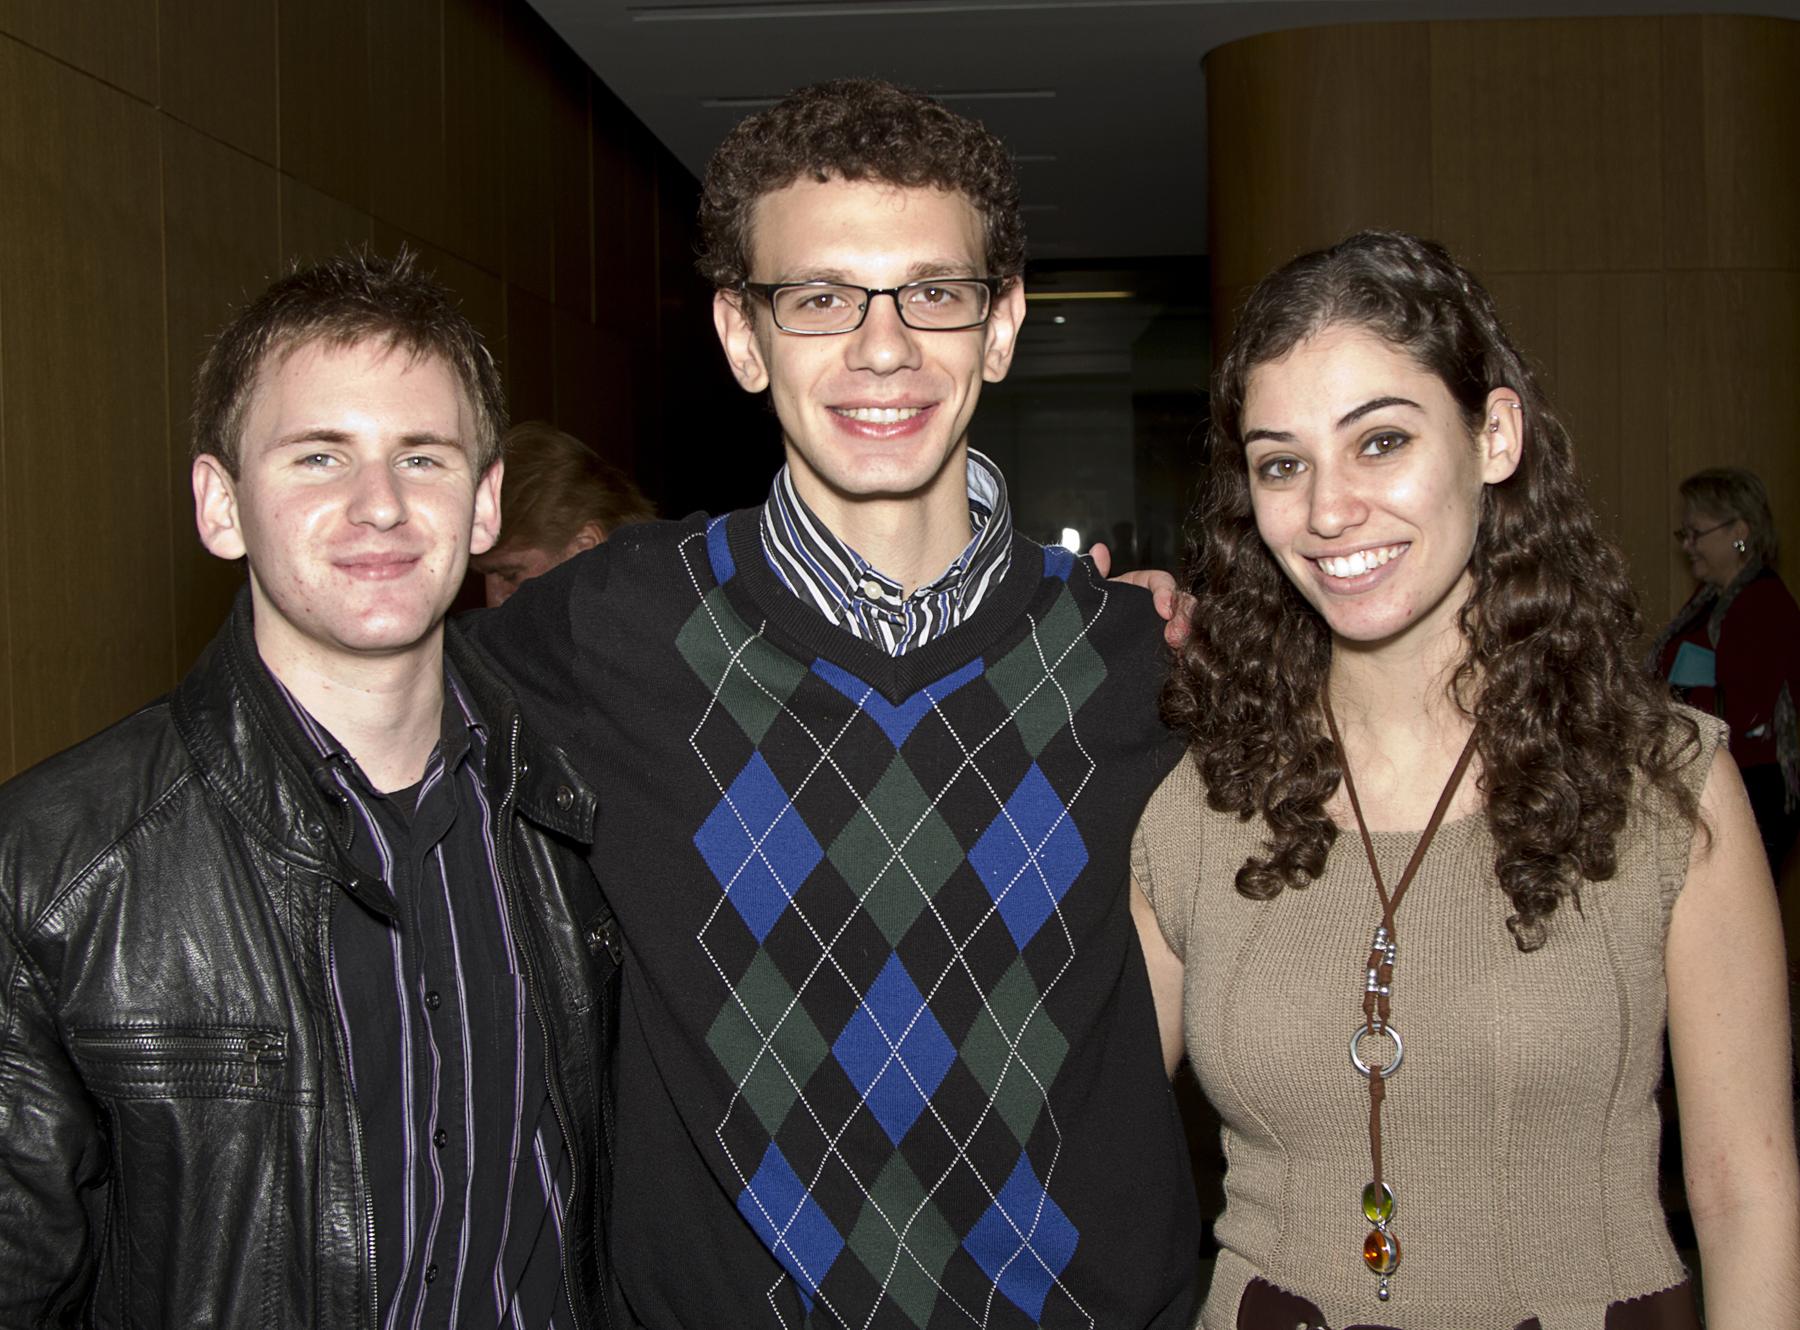 Adam Singer, Michael Like and Melissa Koutsaris